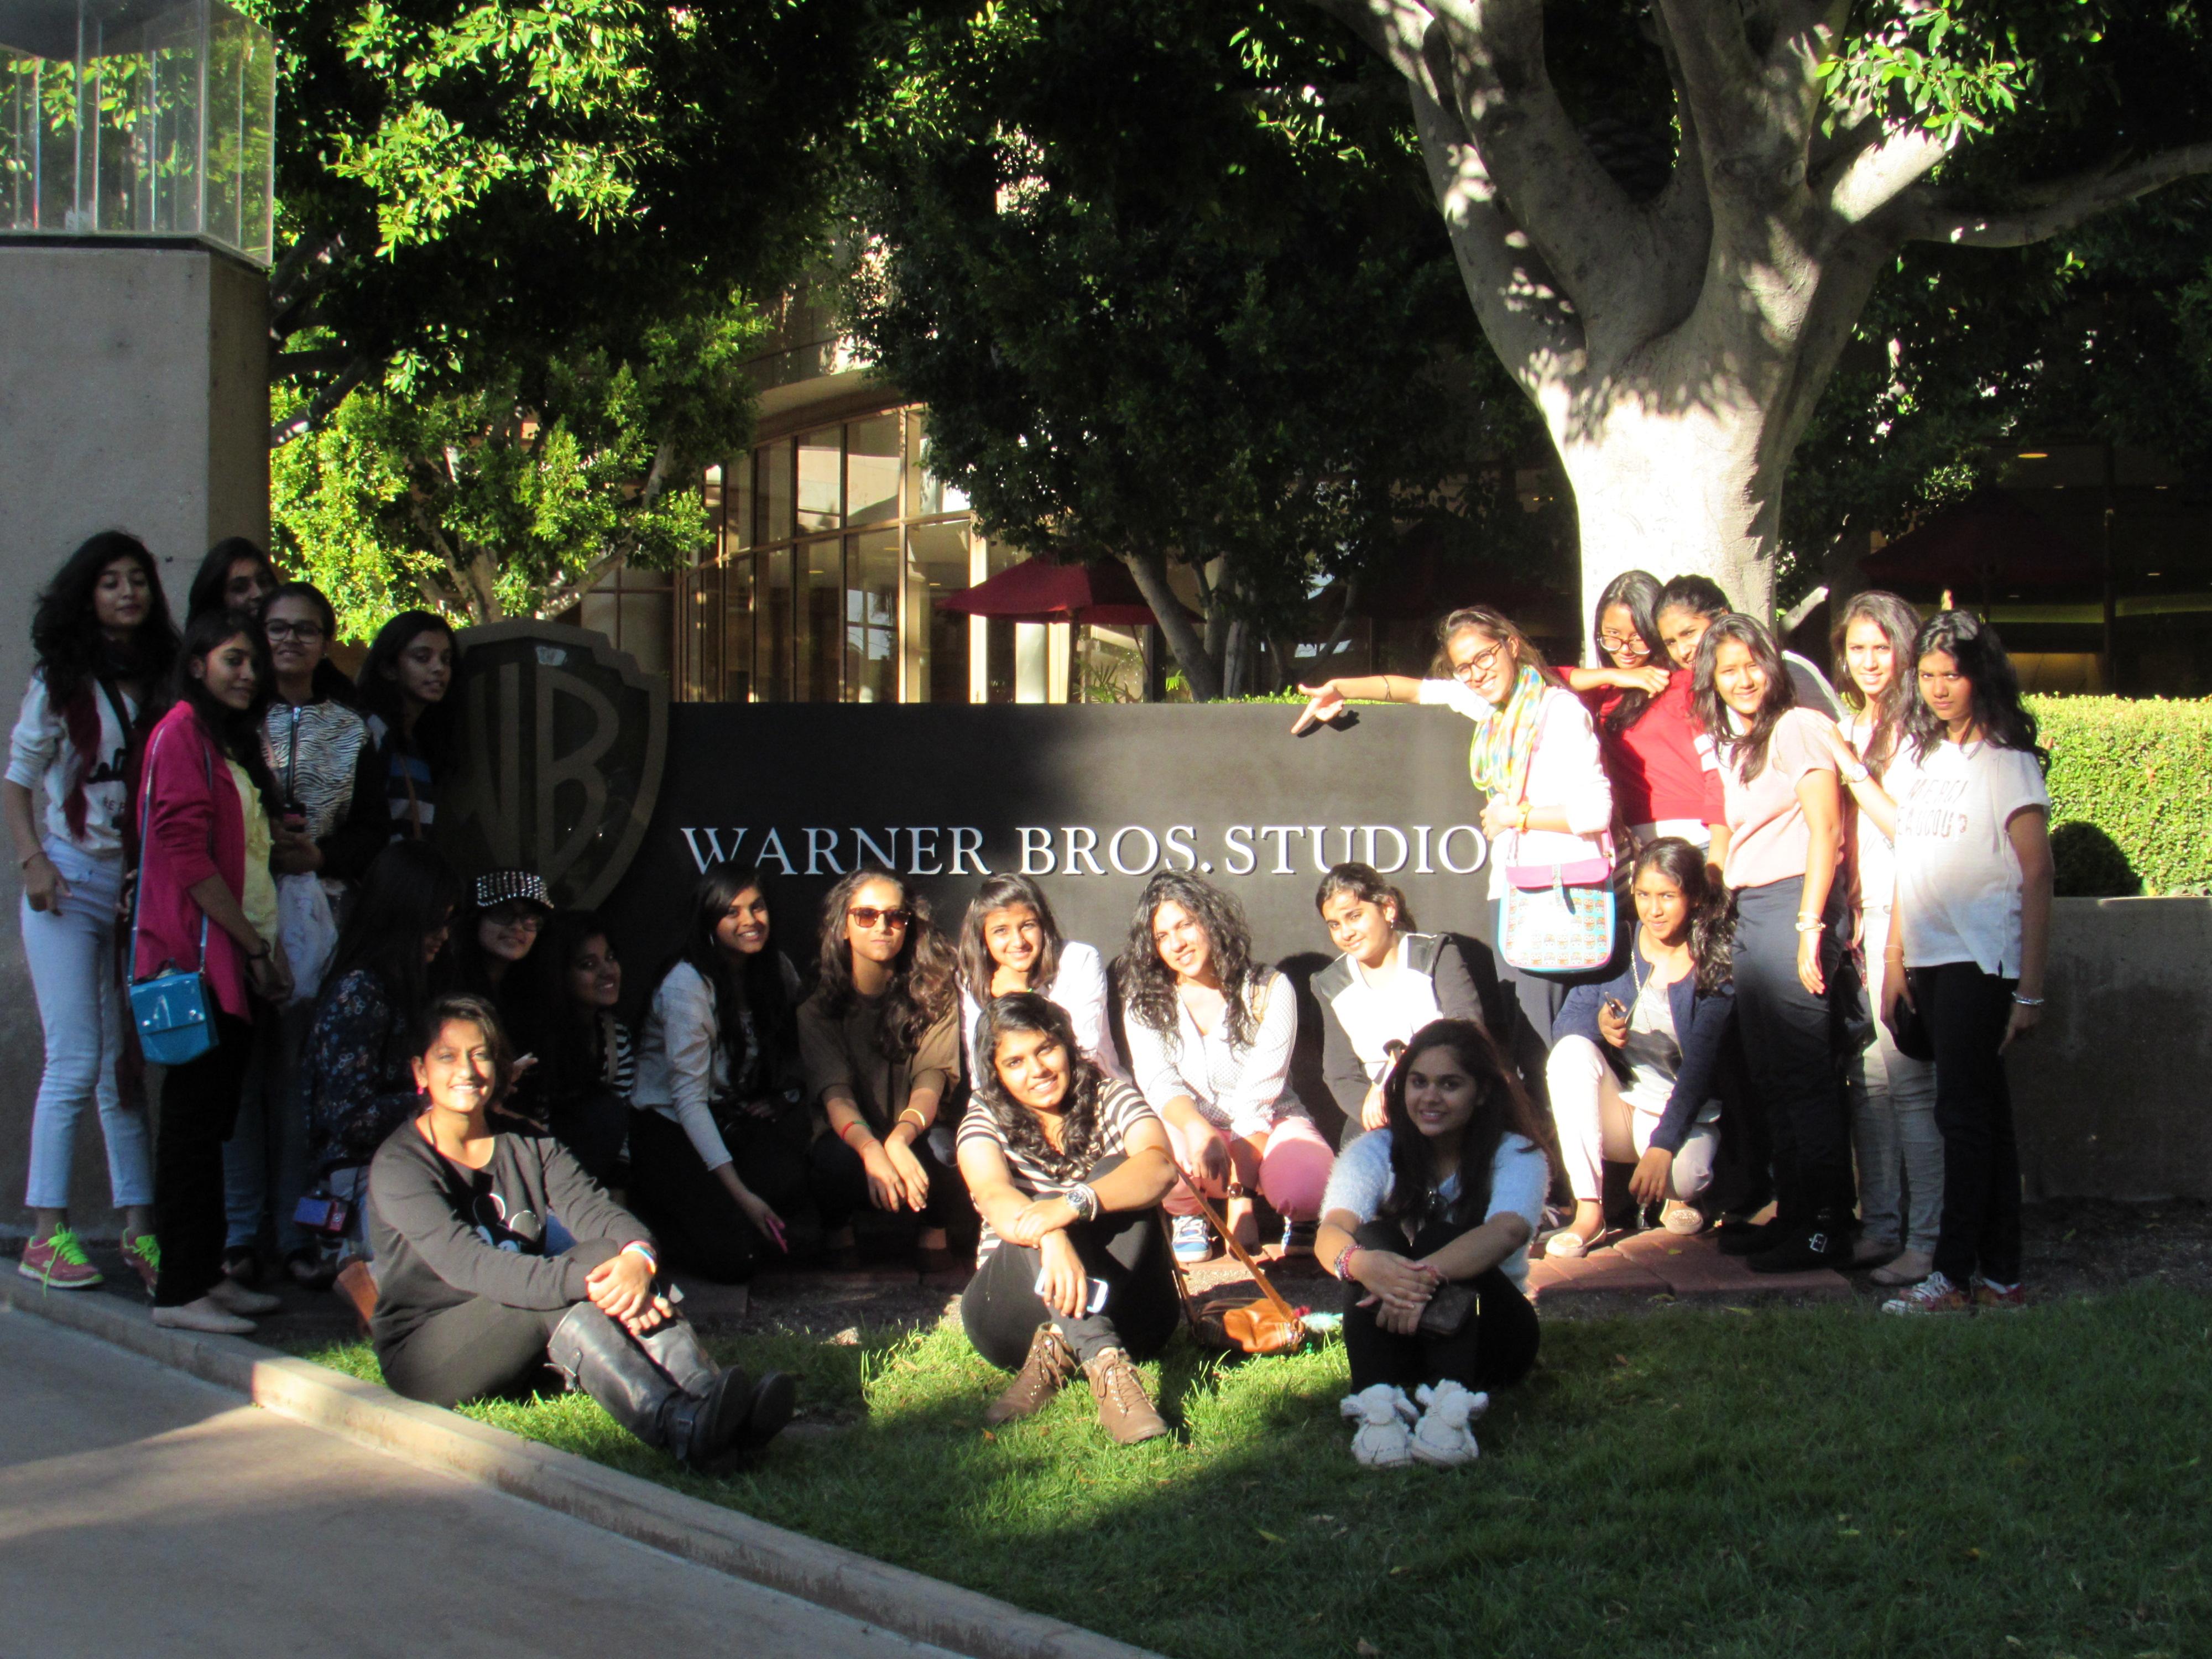 Warner Bros Studio Exploration